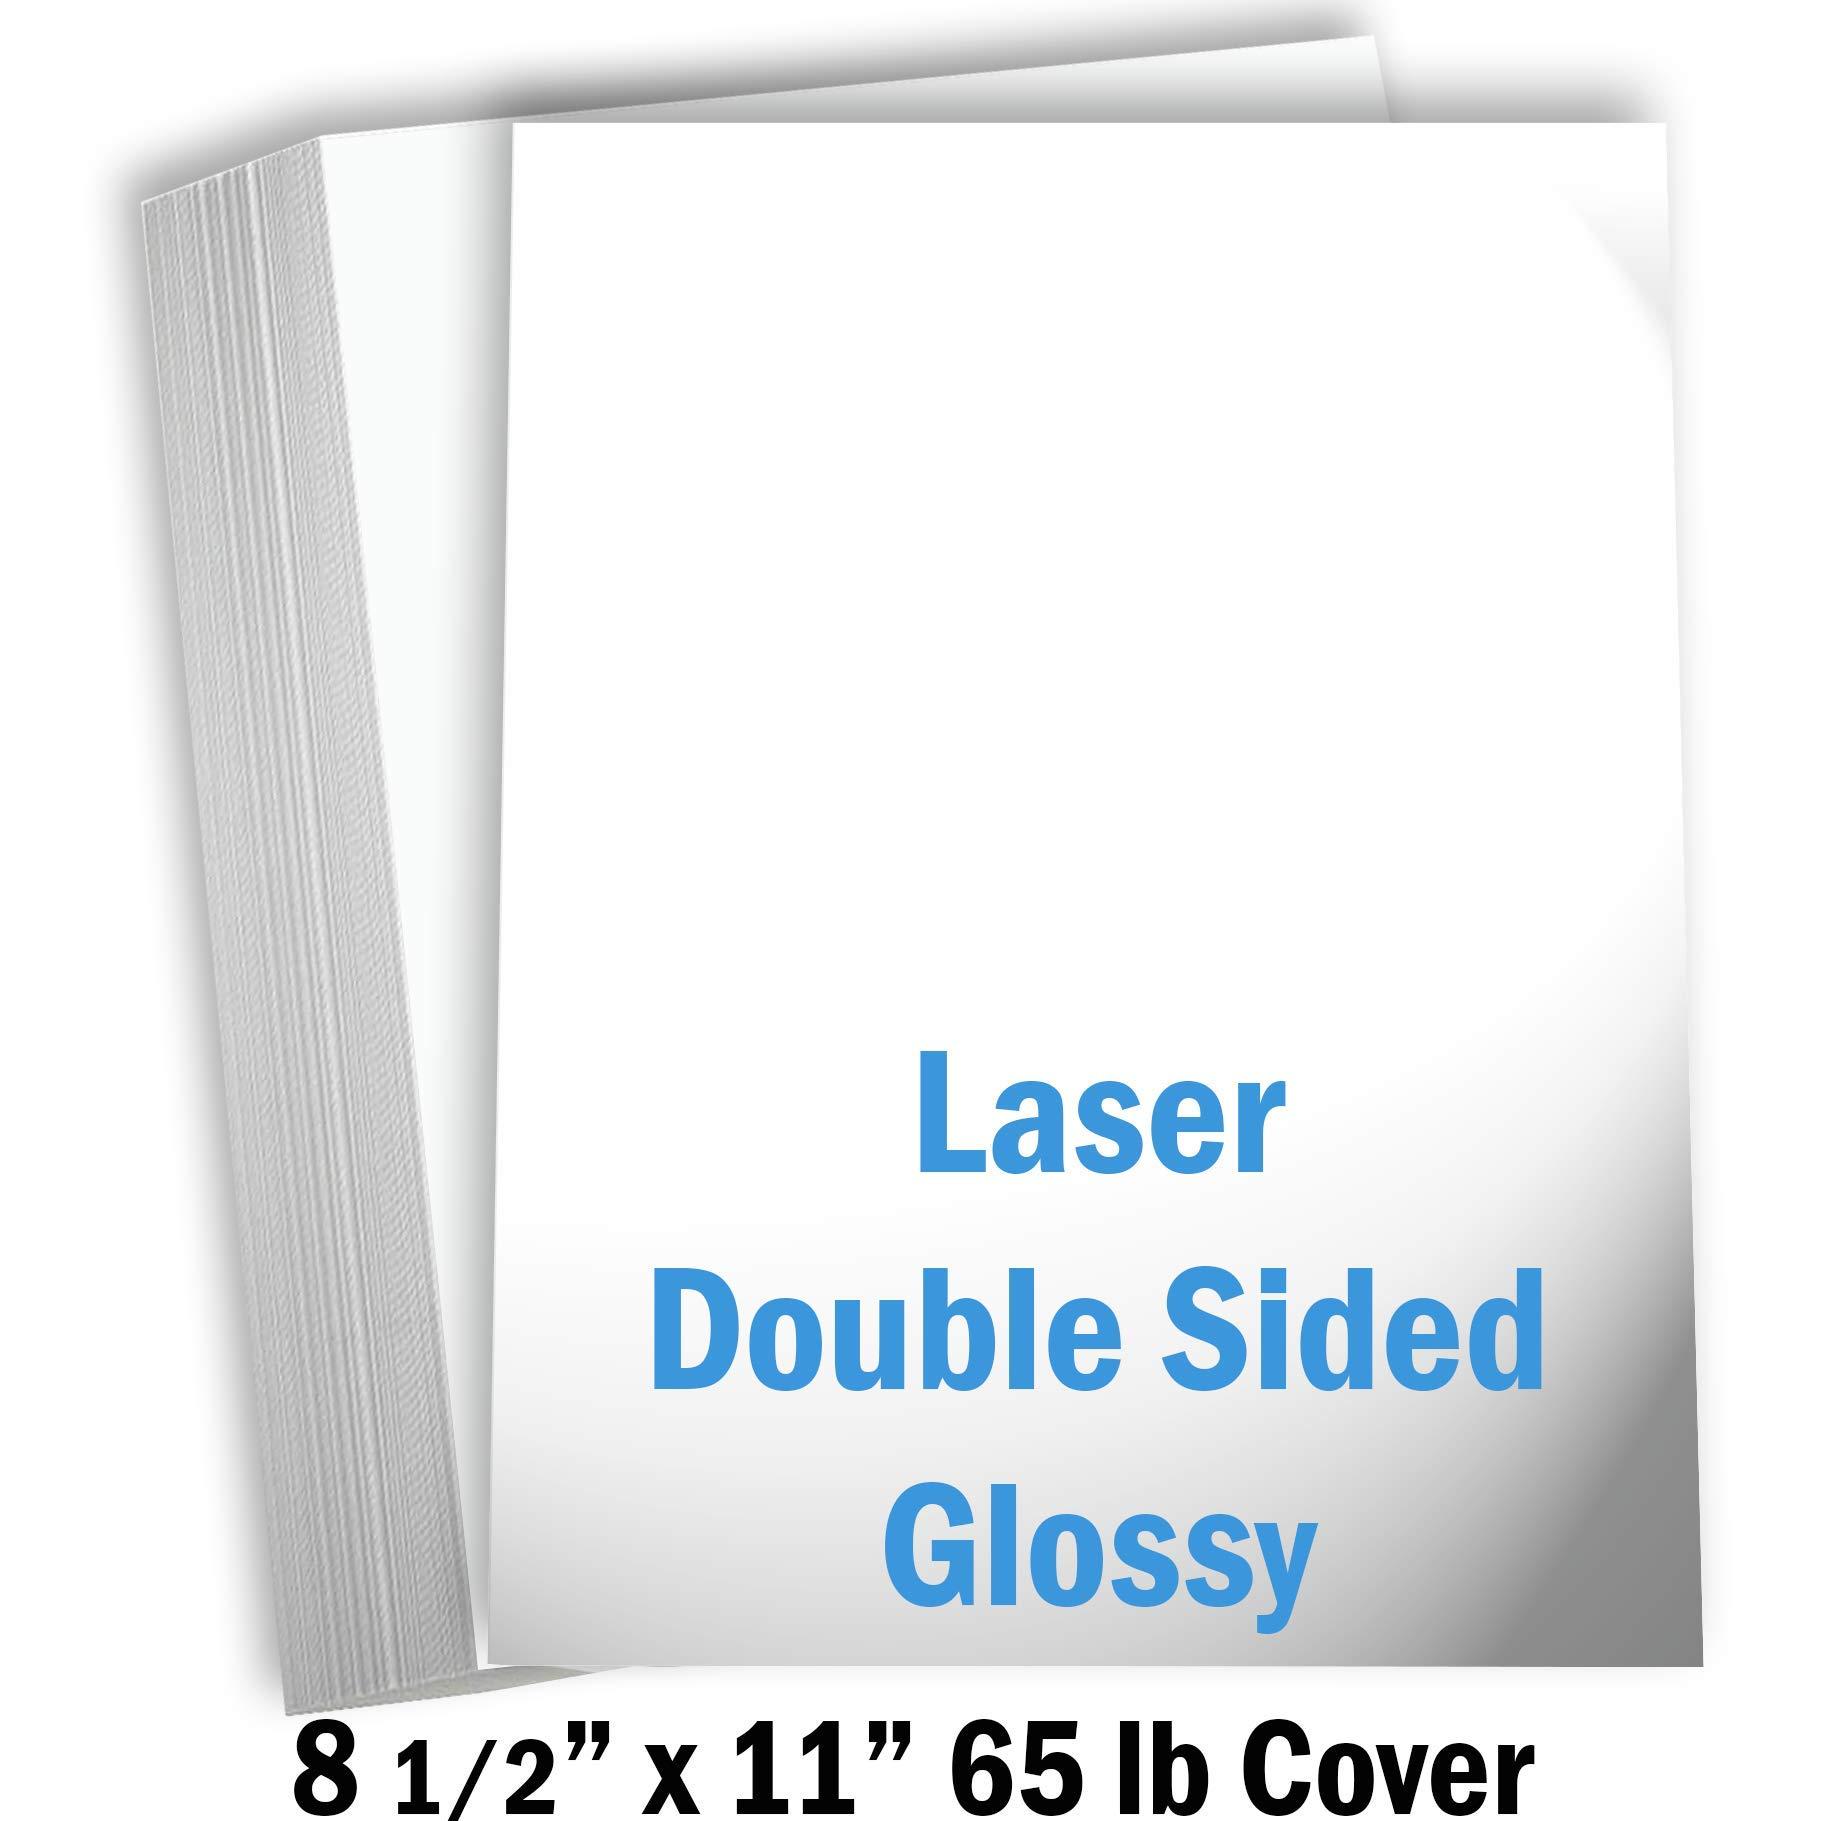 Hamilco White Glossy Cardstock Paper - 8 1/2 x 11'' 65 lb Cover Card Stock - 50 Pack by Hamilco